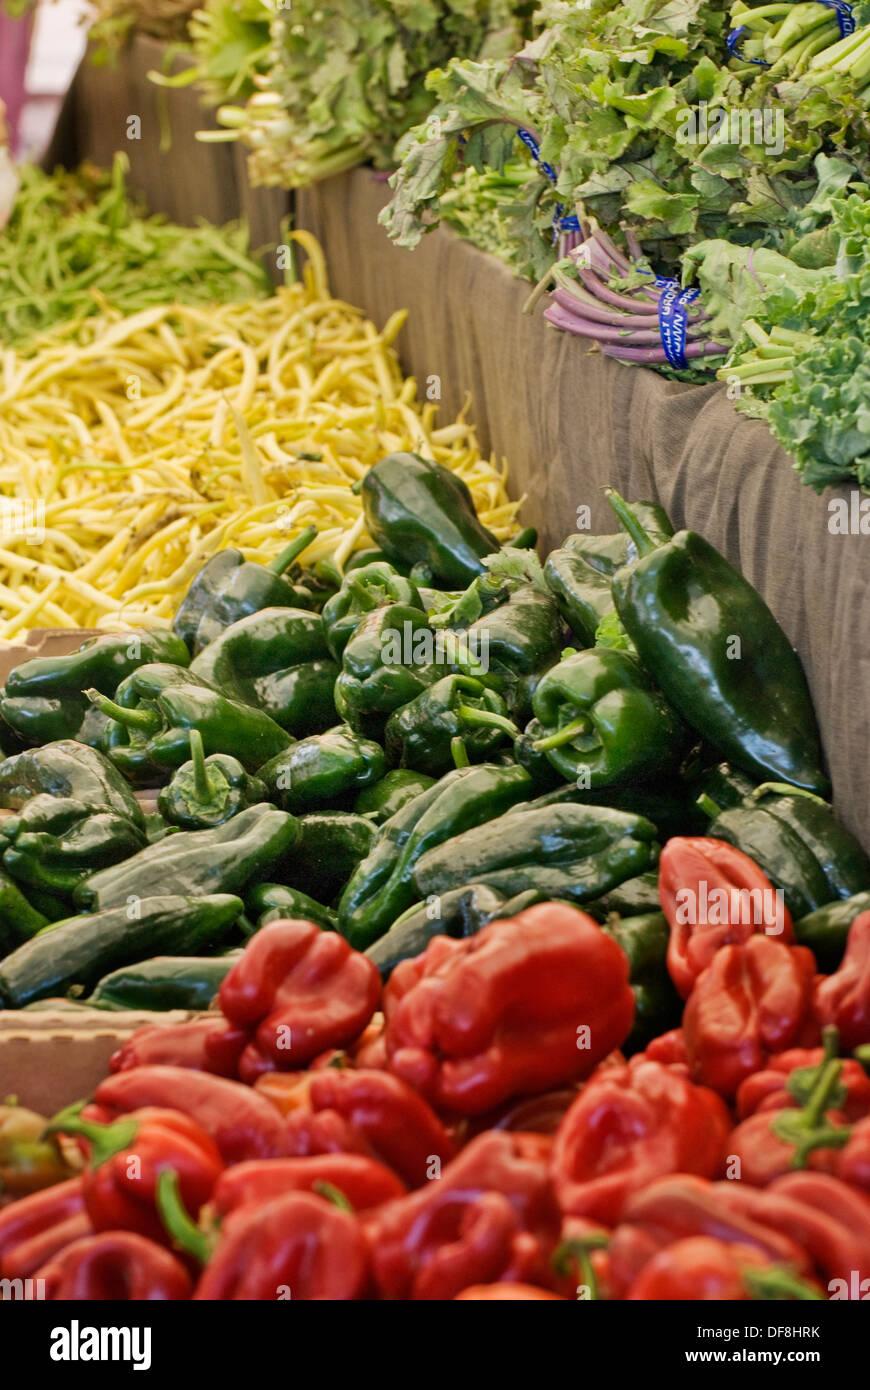 Organic produce at farmers market in upscale California city near San Francisco - Stock Image